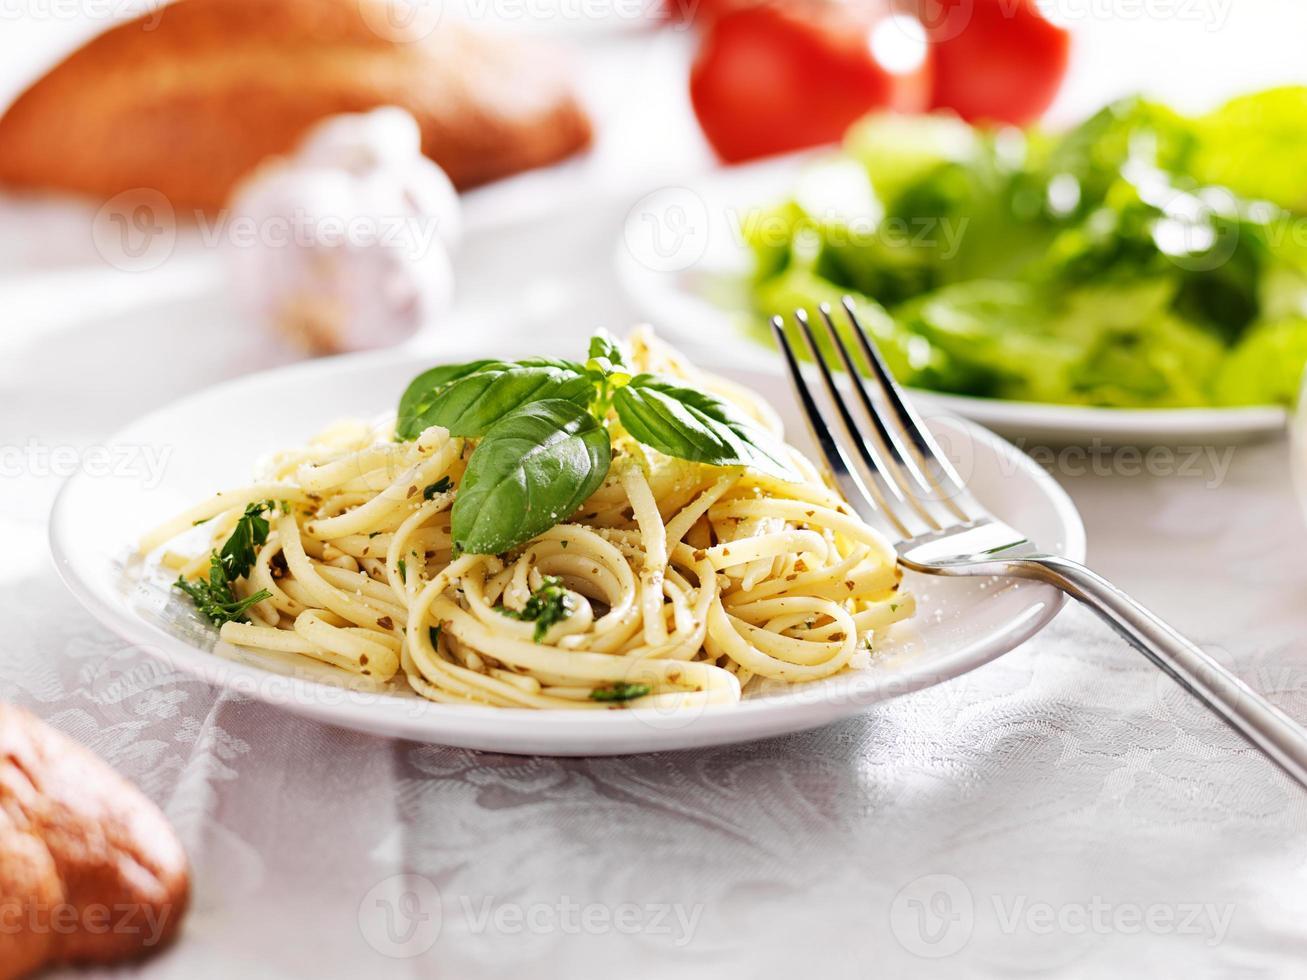 Assiette de spaghettis italiens avec sauce au pesto photo